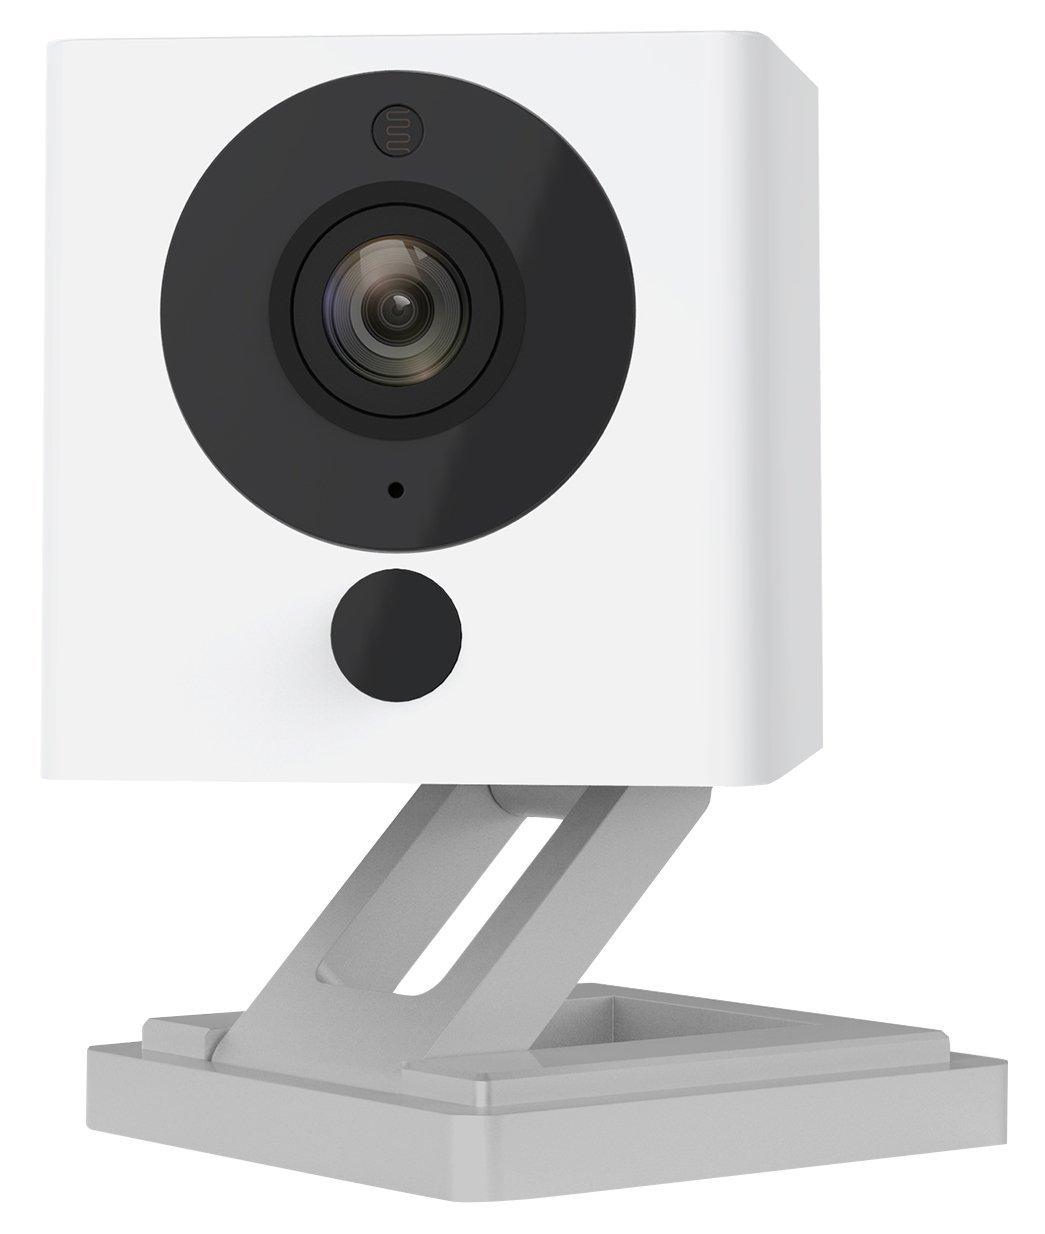 wyze cam v2 1080p hd indoor wireless smart home camera fs w prime